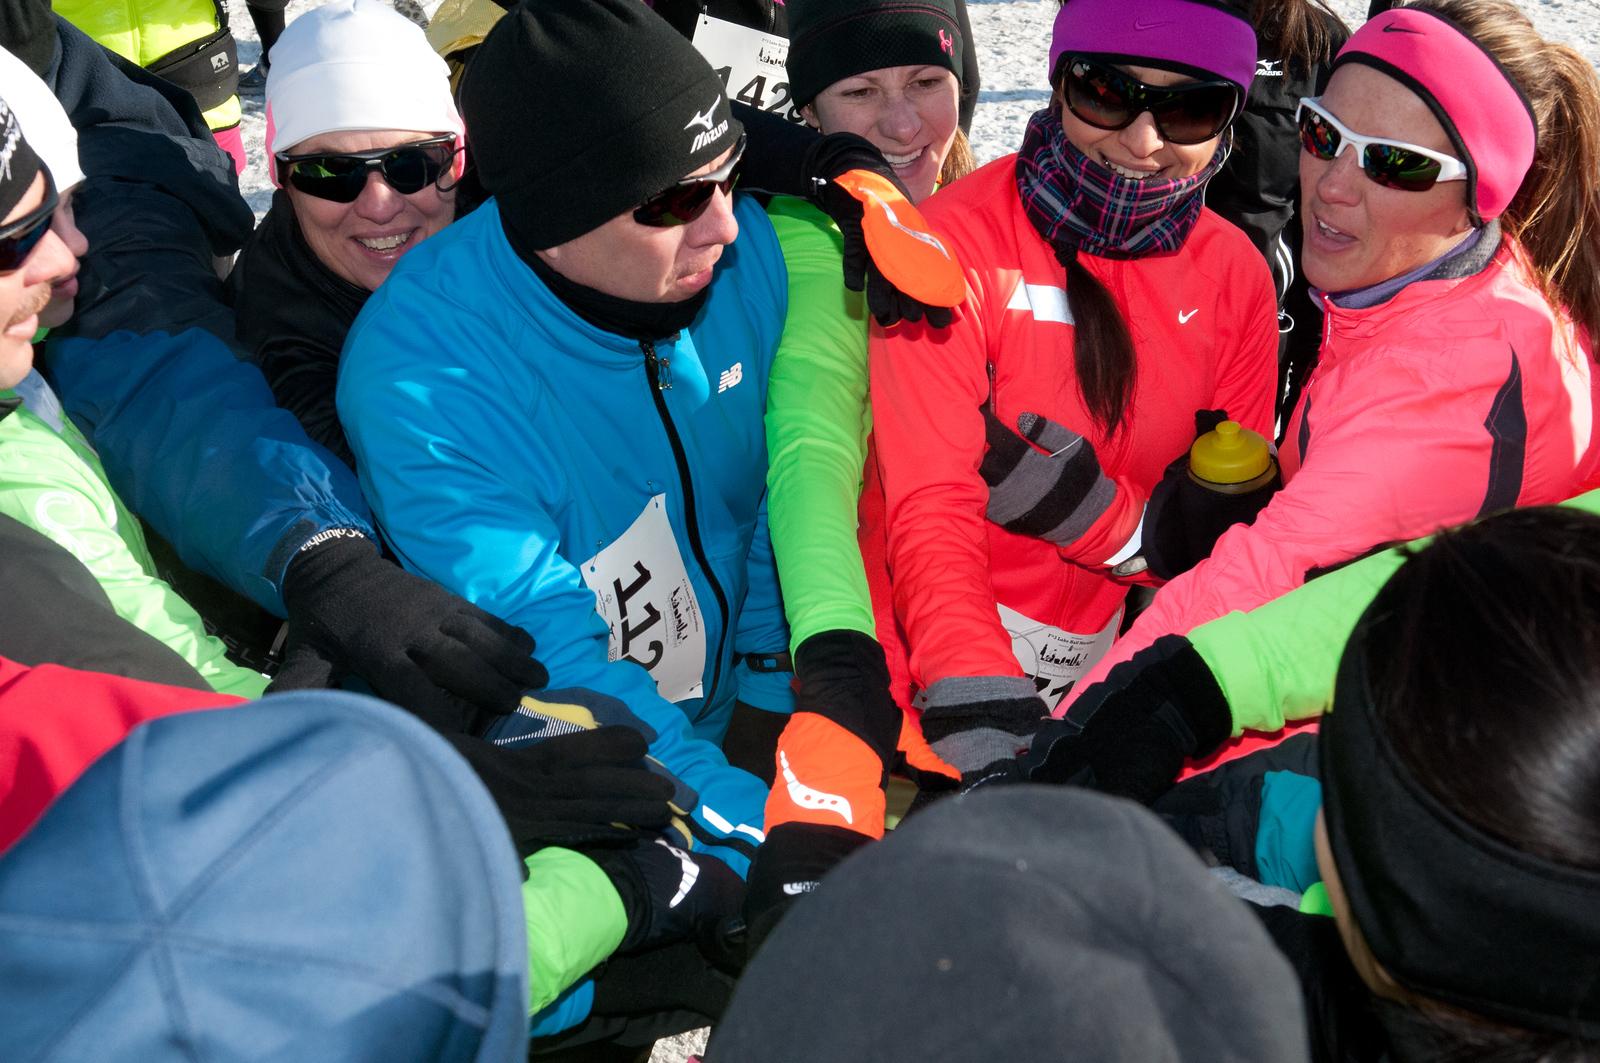 2013 F^3 Half Marathon